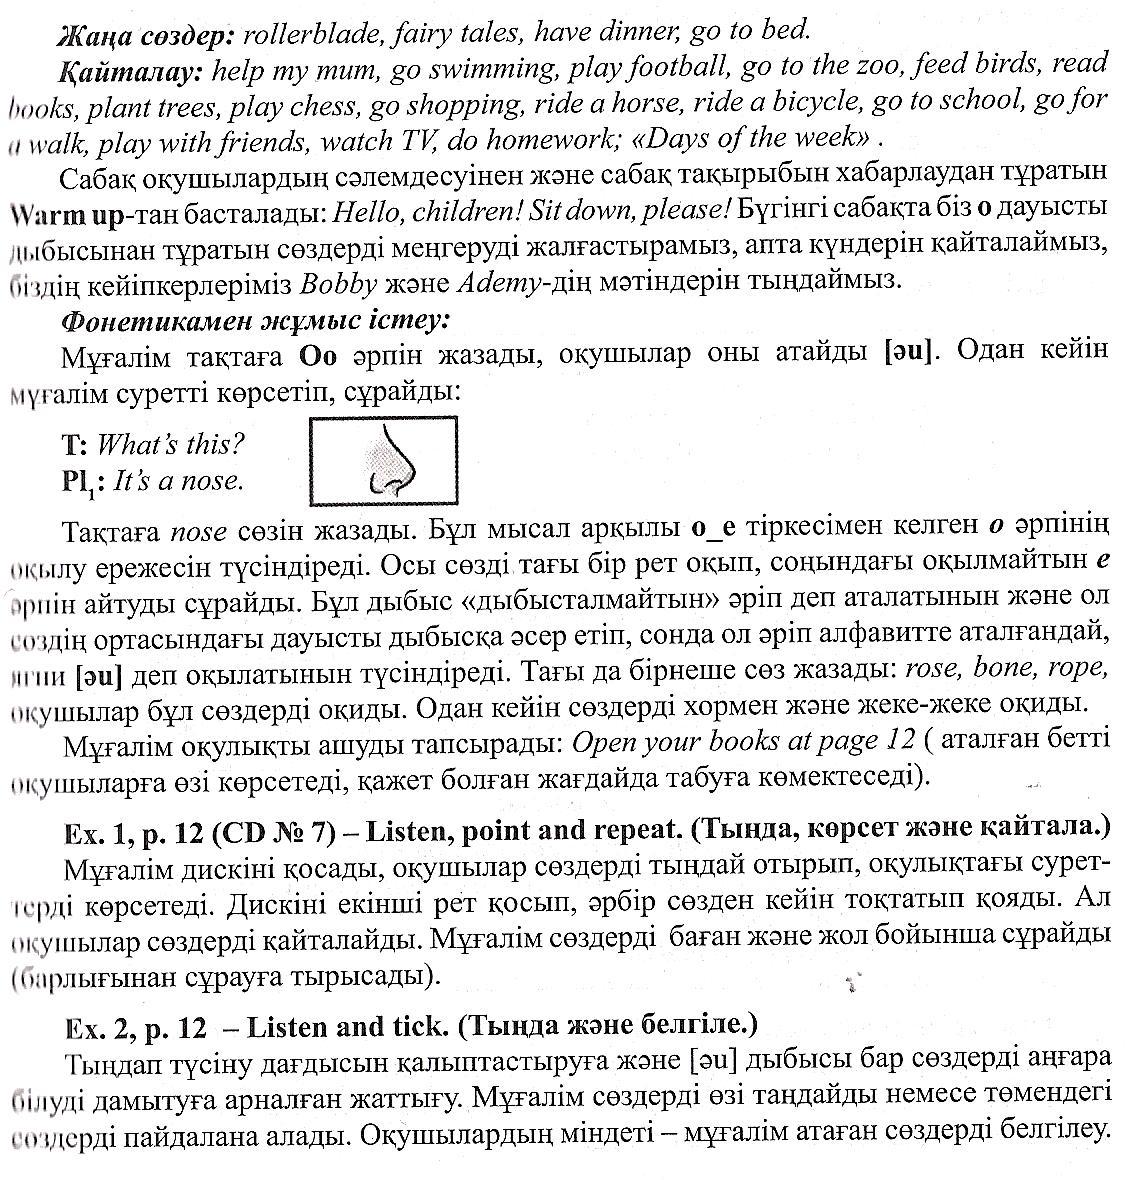 C:\Documents and Settings\User\Local Settings\Temporary Internet Files\Content.Word\сканирование0020.jpg